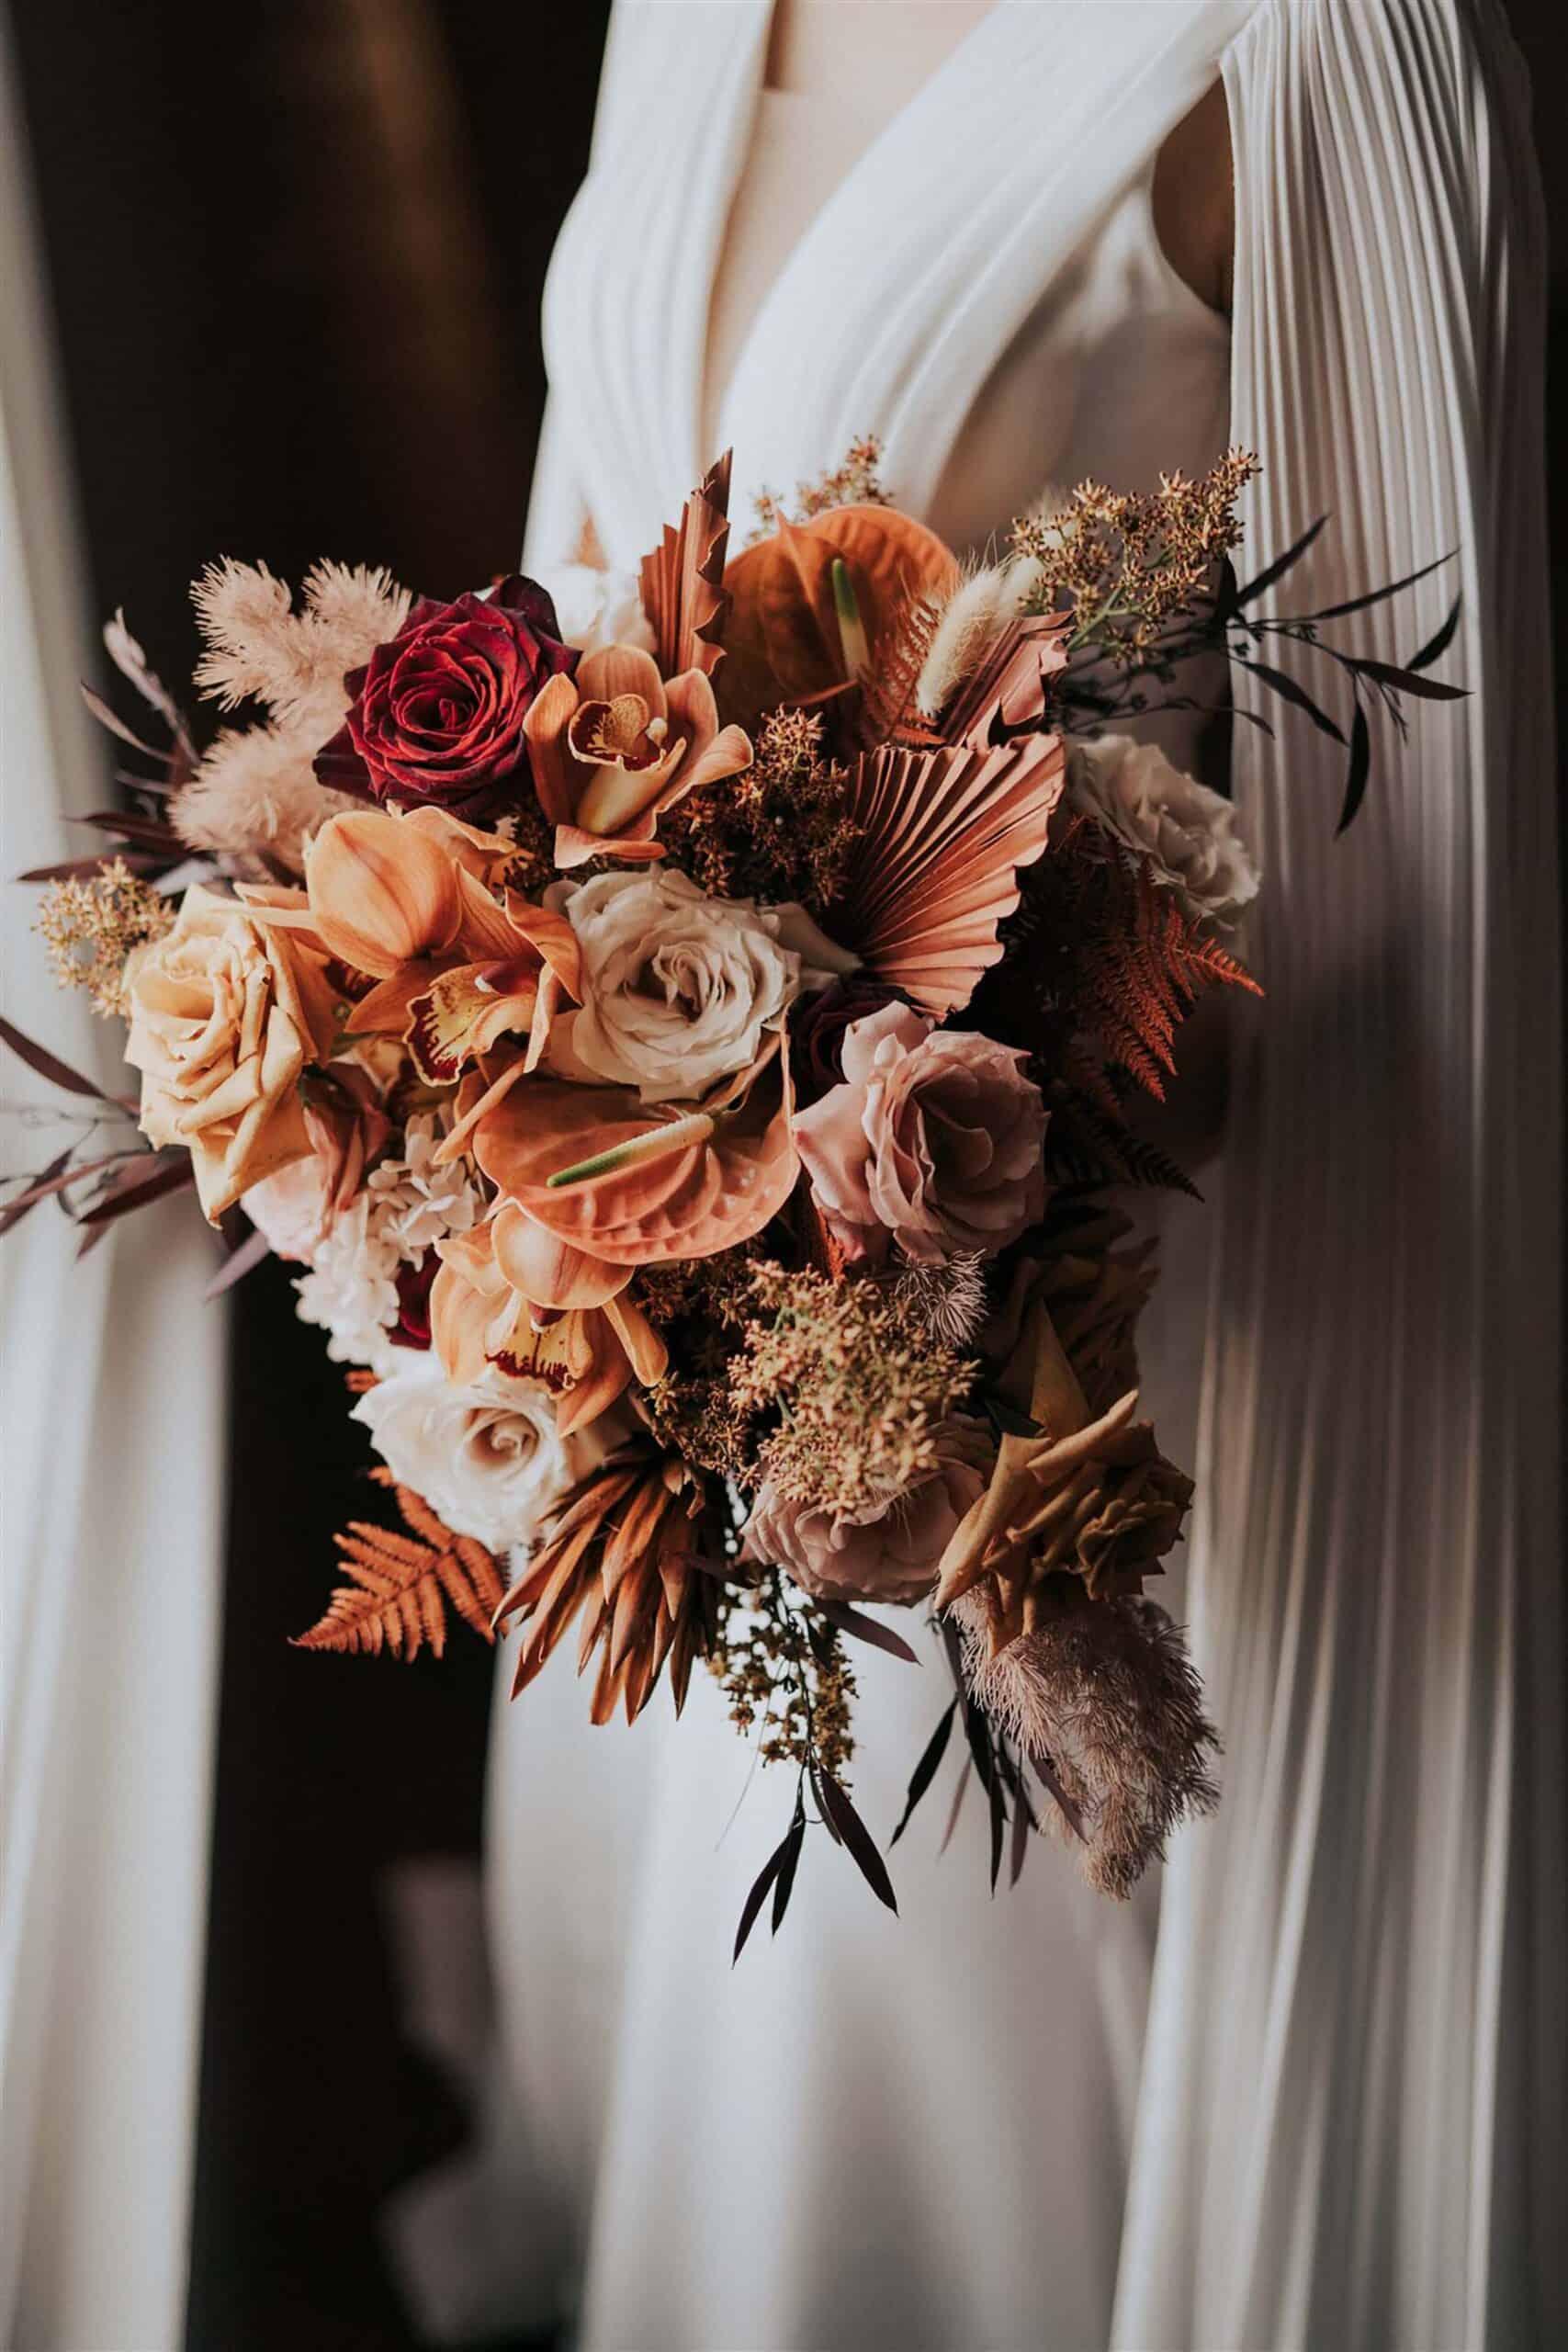 Autumn Rustic Bouquet